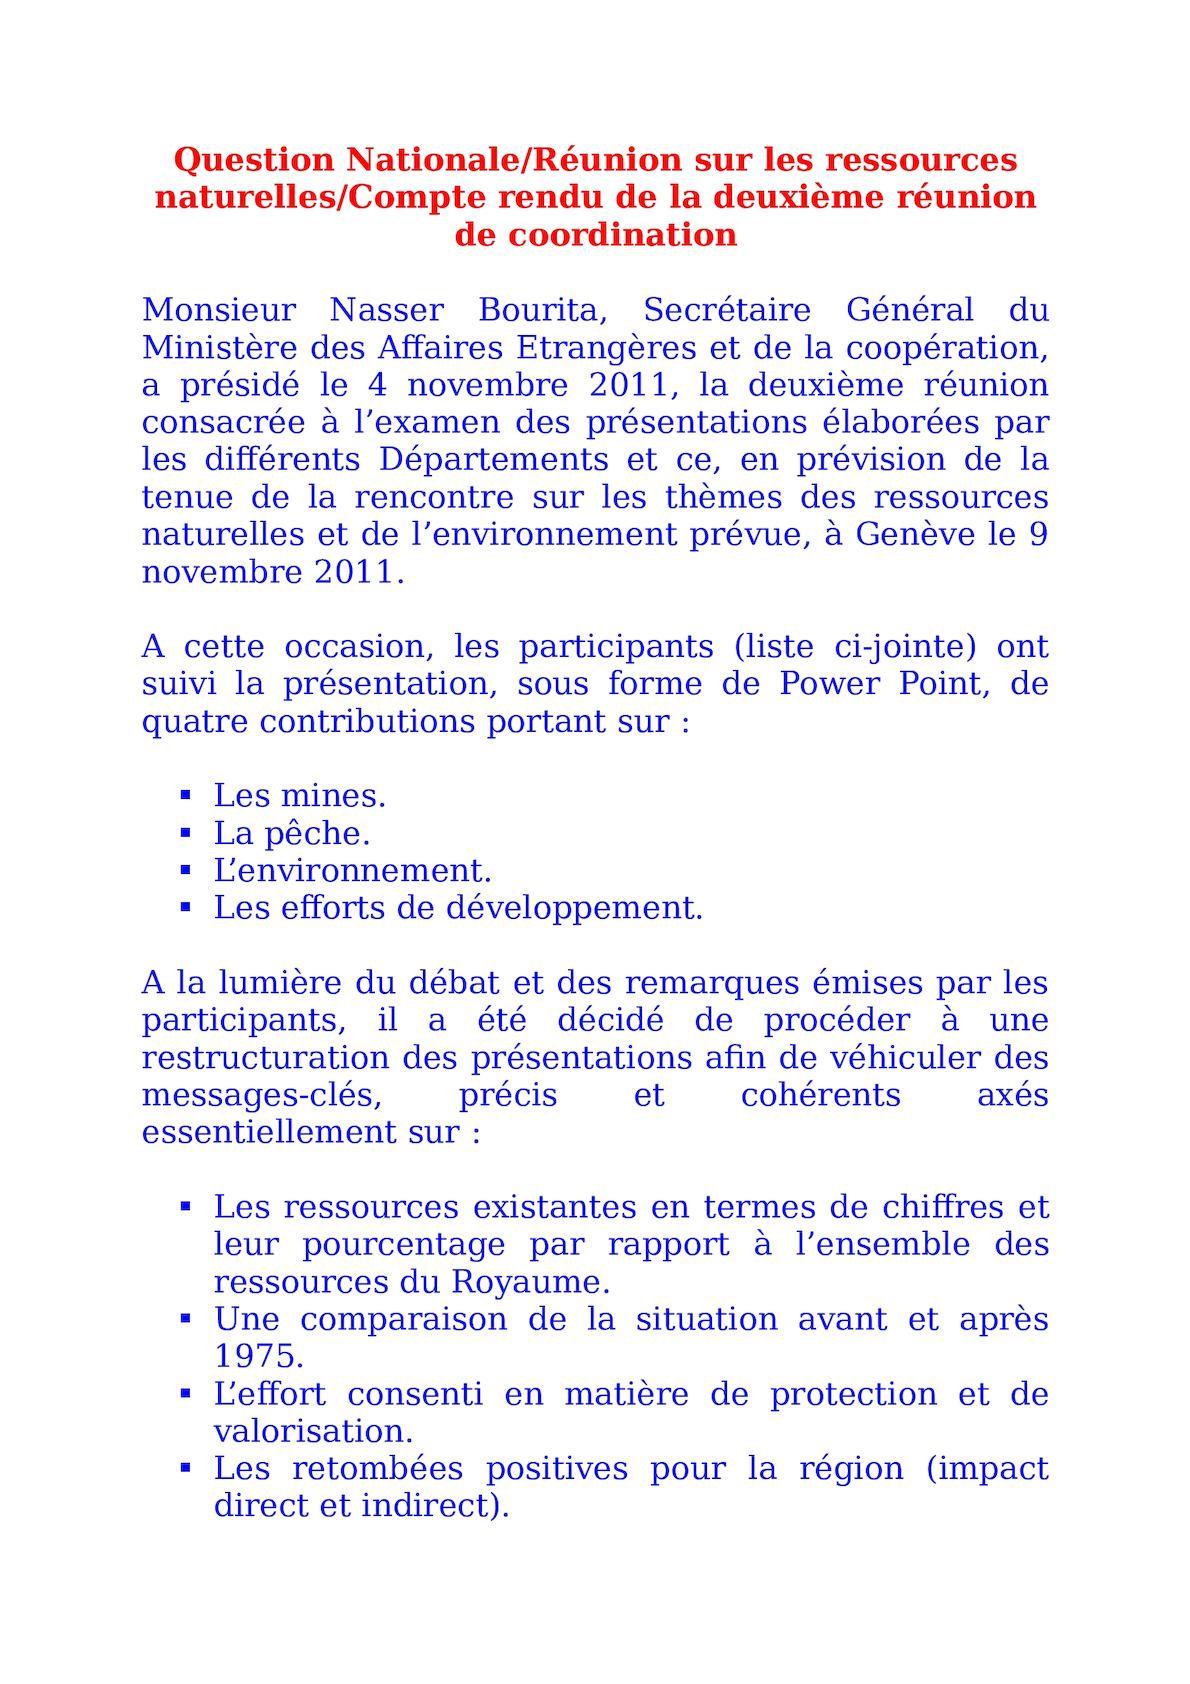 Question Nationale PV 4 Novembre